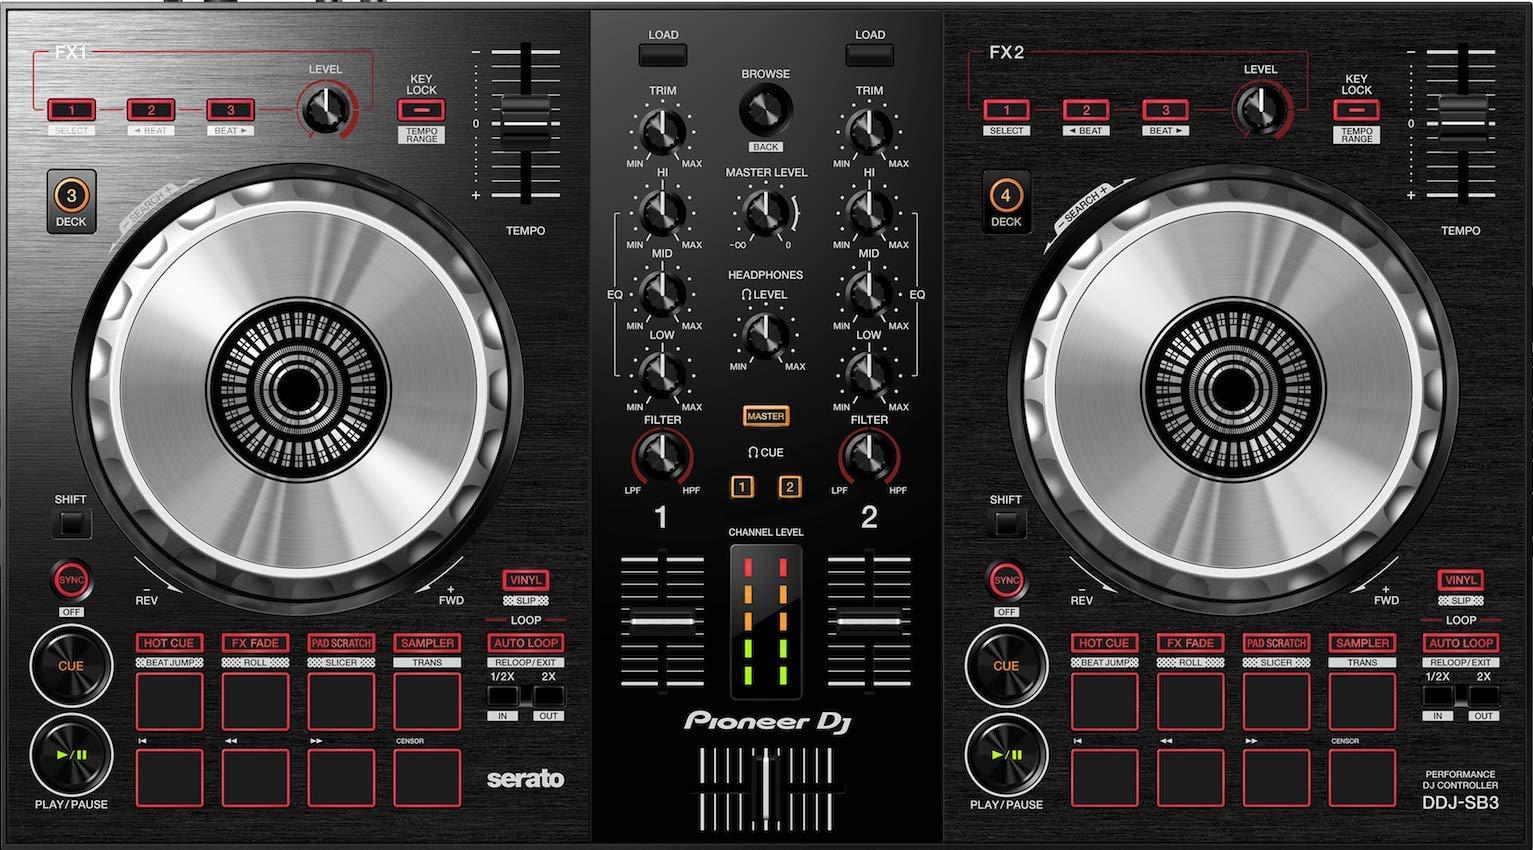 Pioneer DJ DJ Controller, Black (DDJ-SB3) by Pioneer DJ